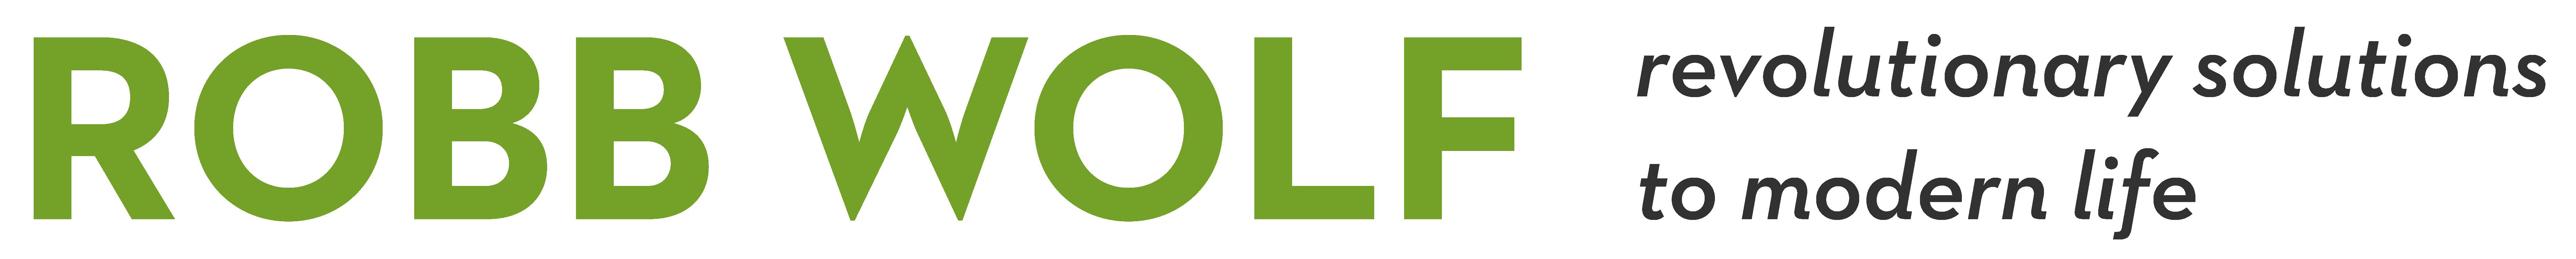 Robb Wolf logo